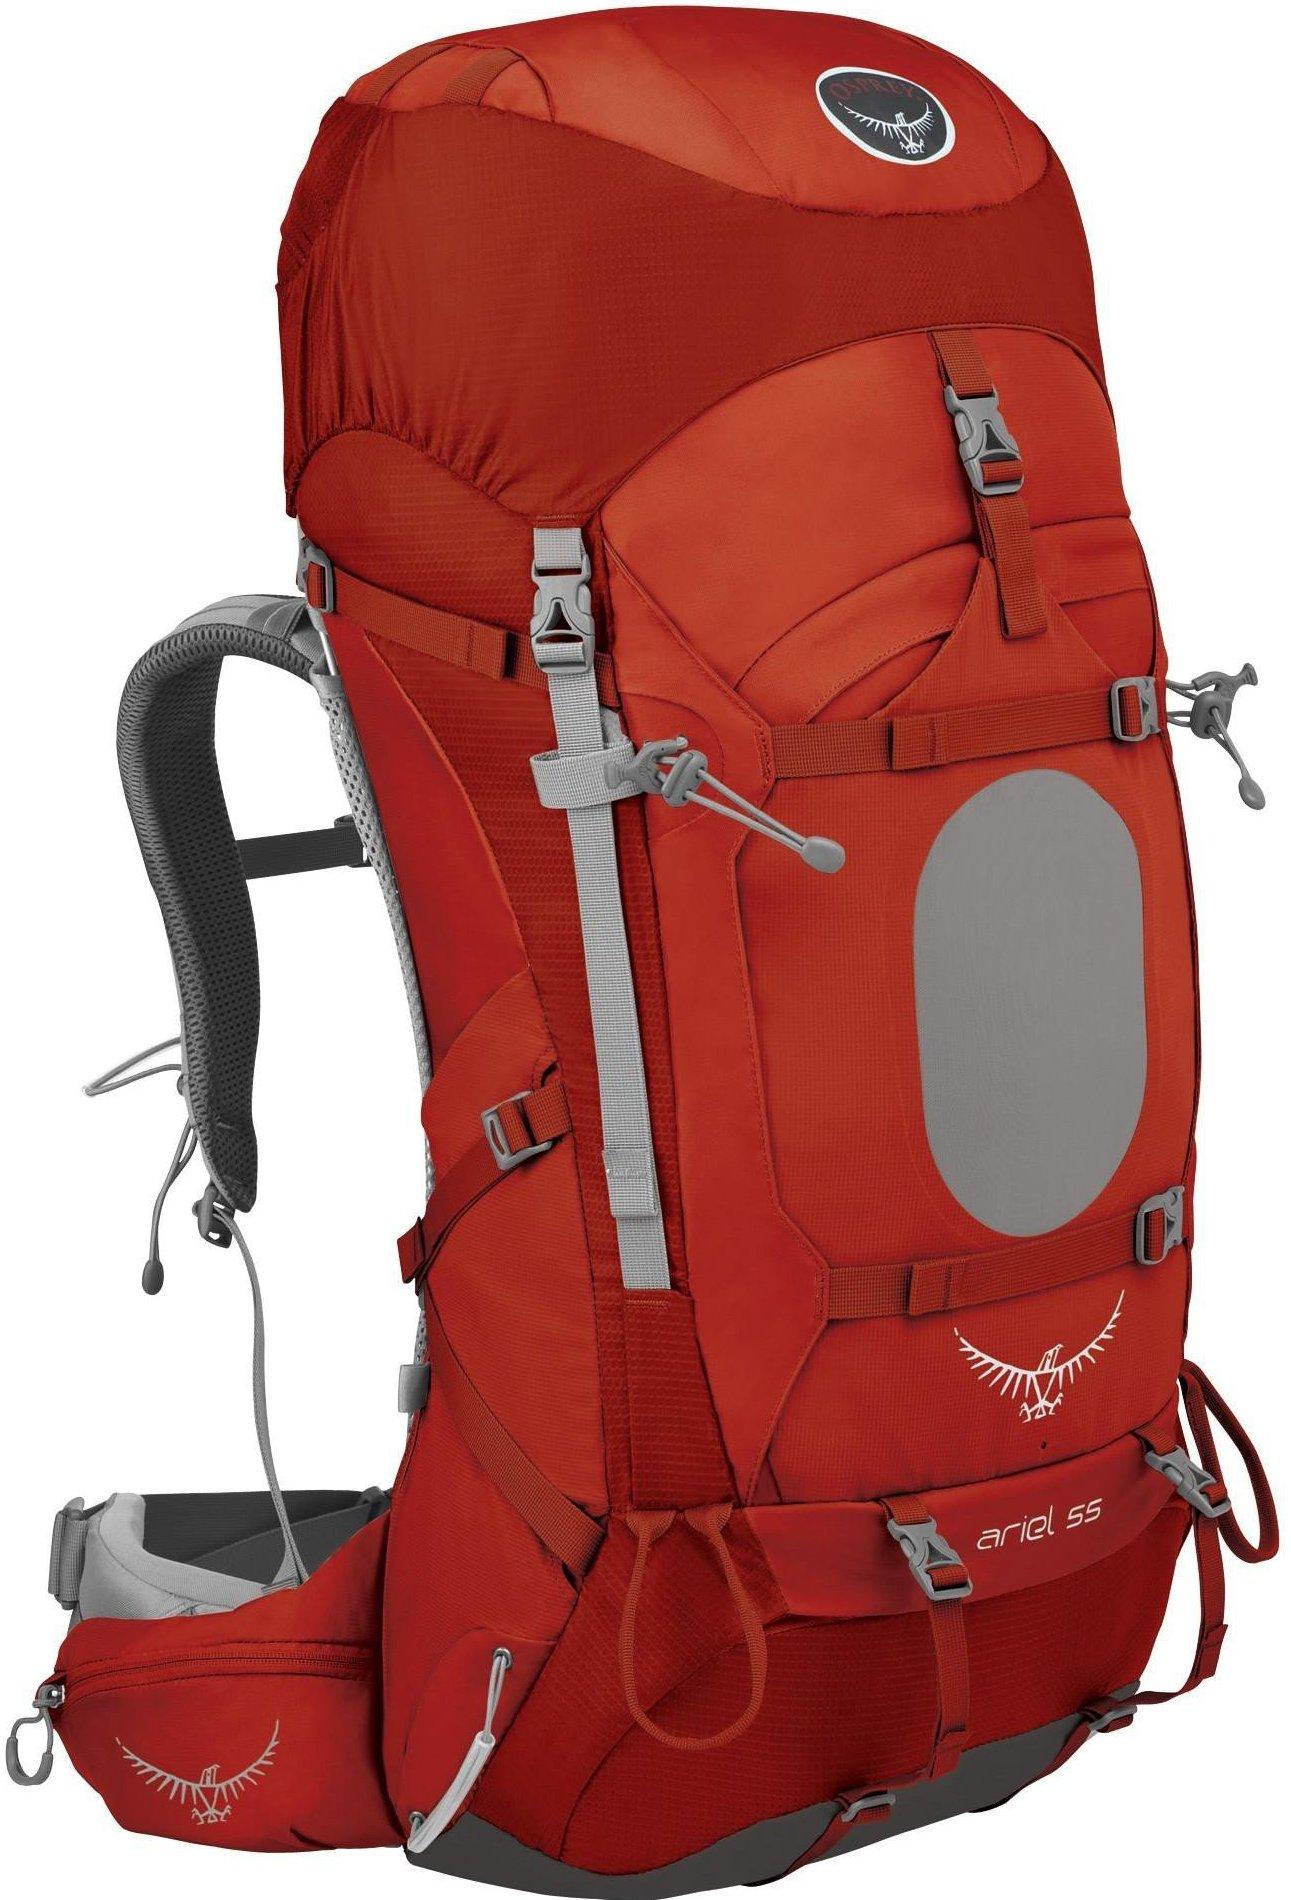 [ Osprey ] Ariel 55 精靈 女款 專業登山健行後背包 紅